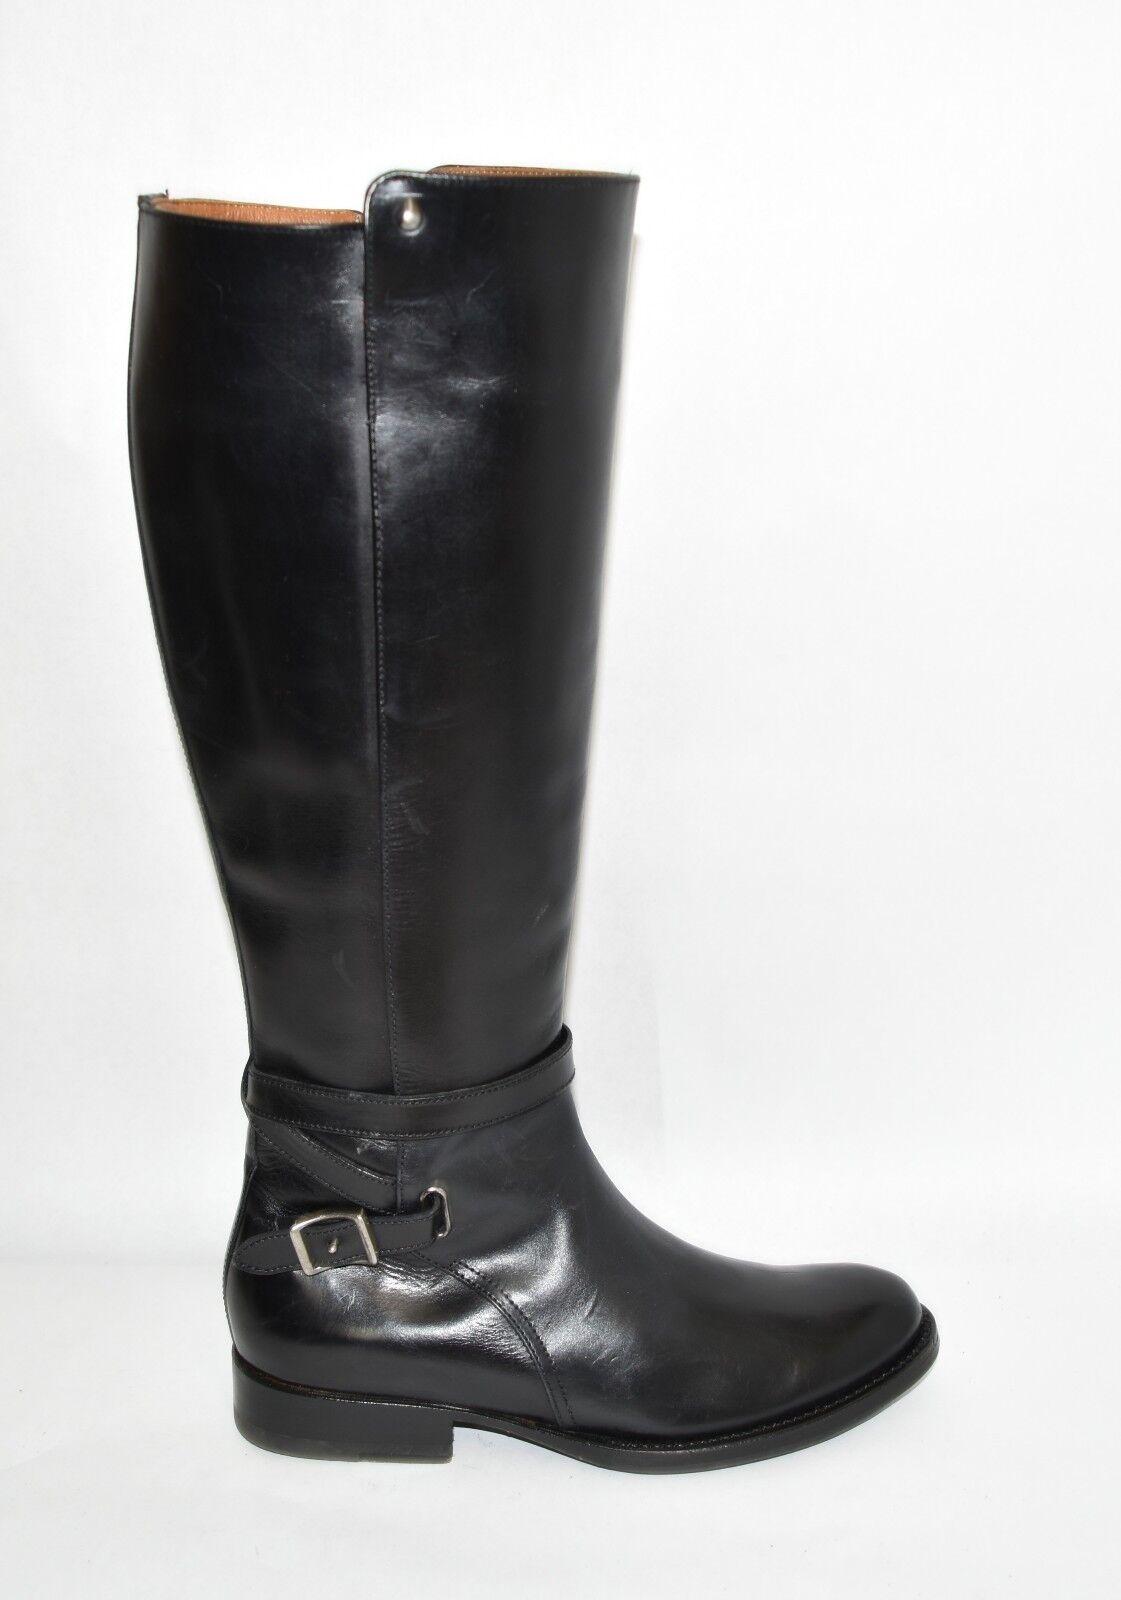 New  Frye 'Jordan Buckle Strap Knee High Boot' 3476089 Black Leather Size 7 T11